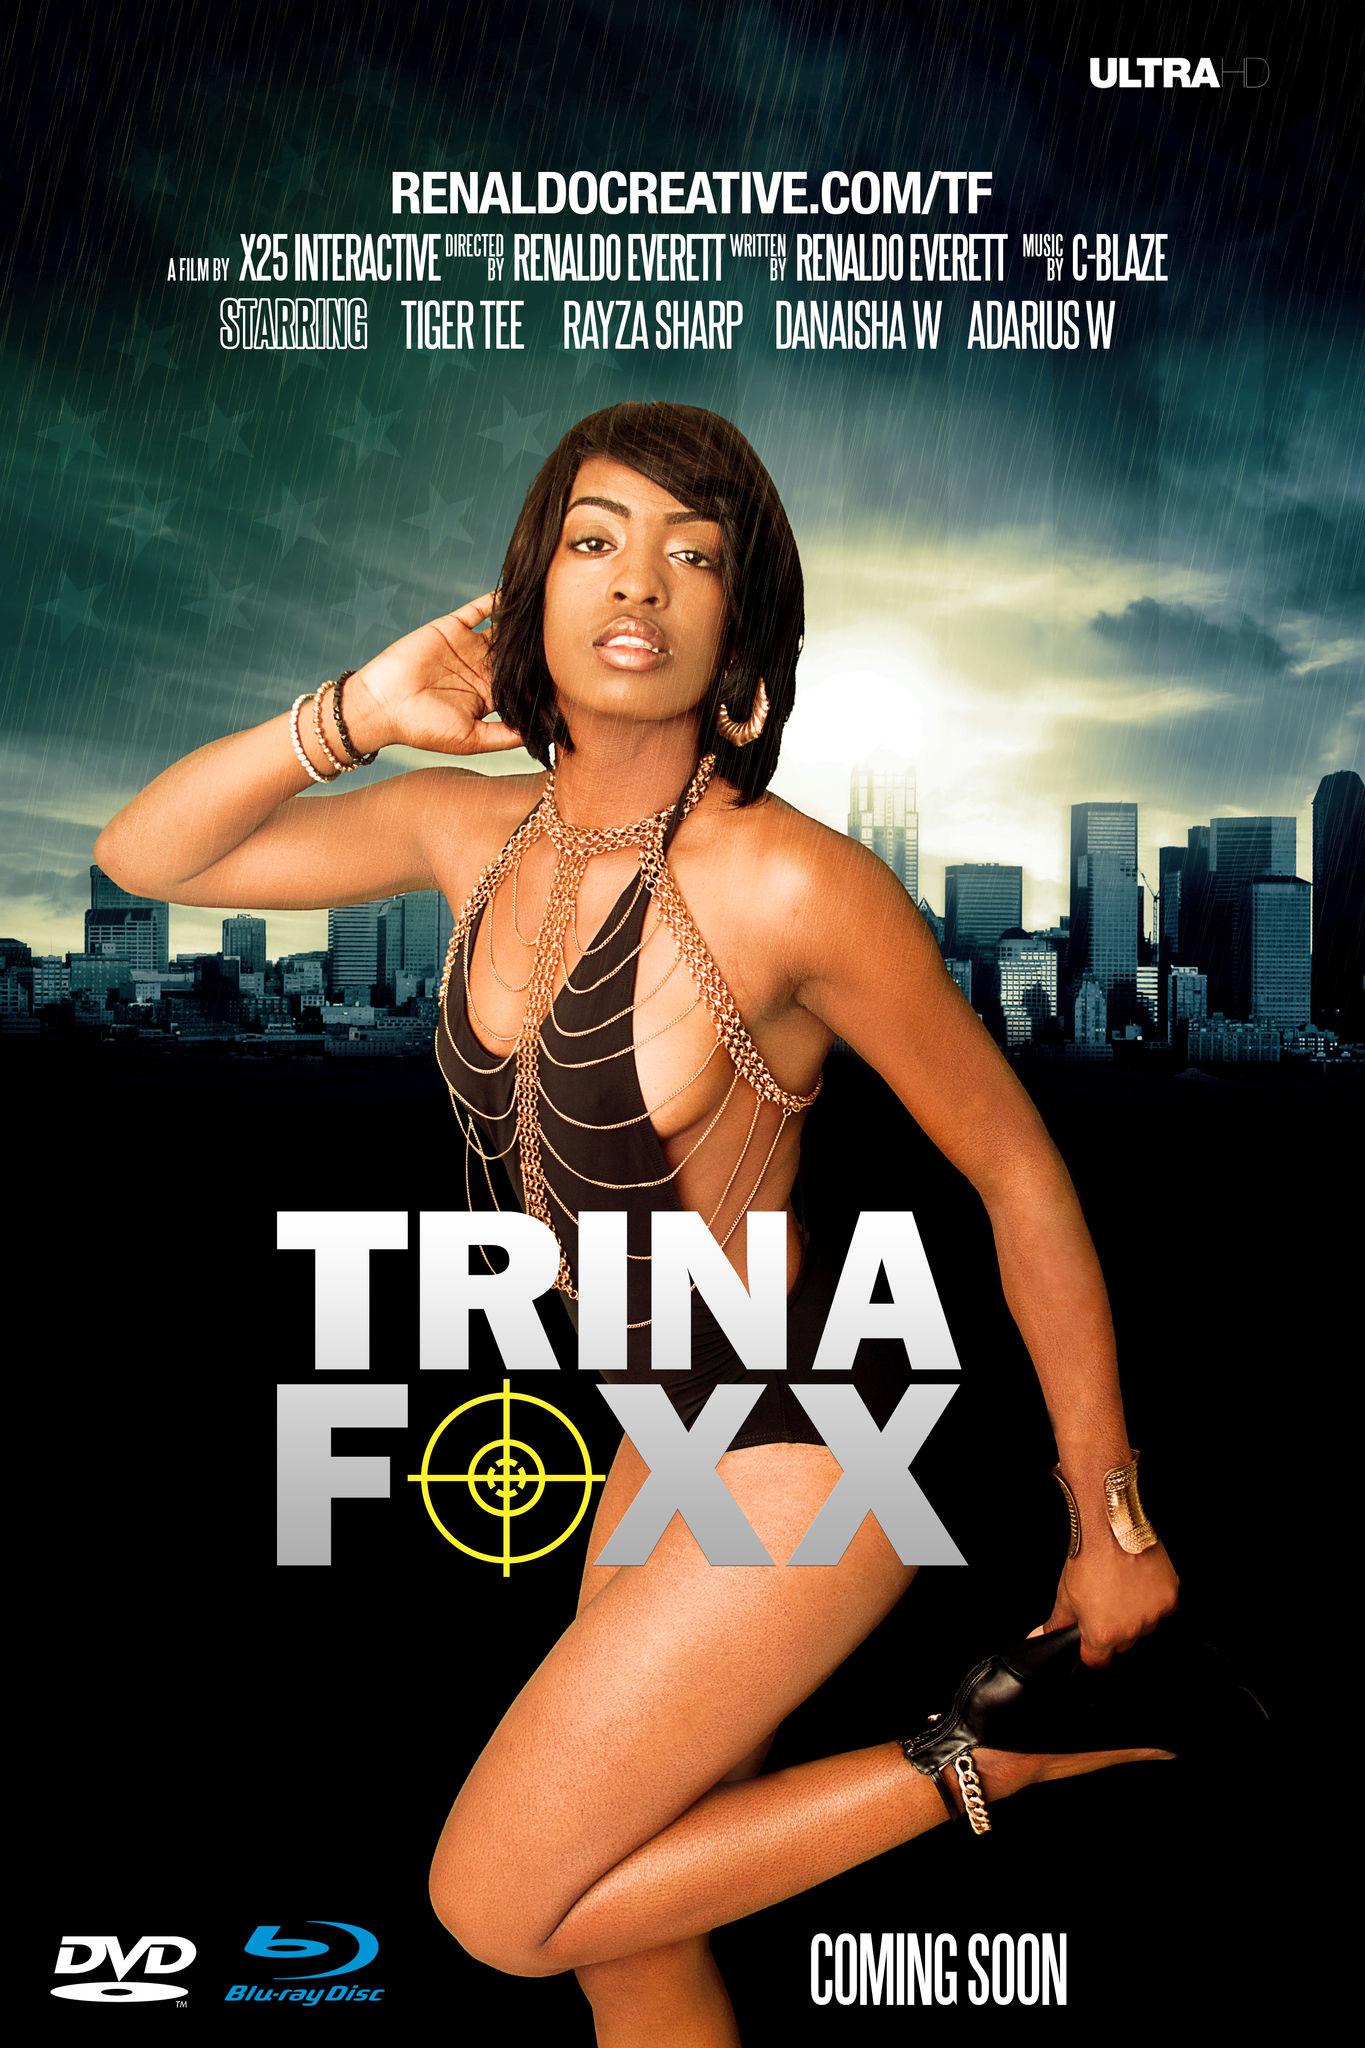 Trina Foxx